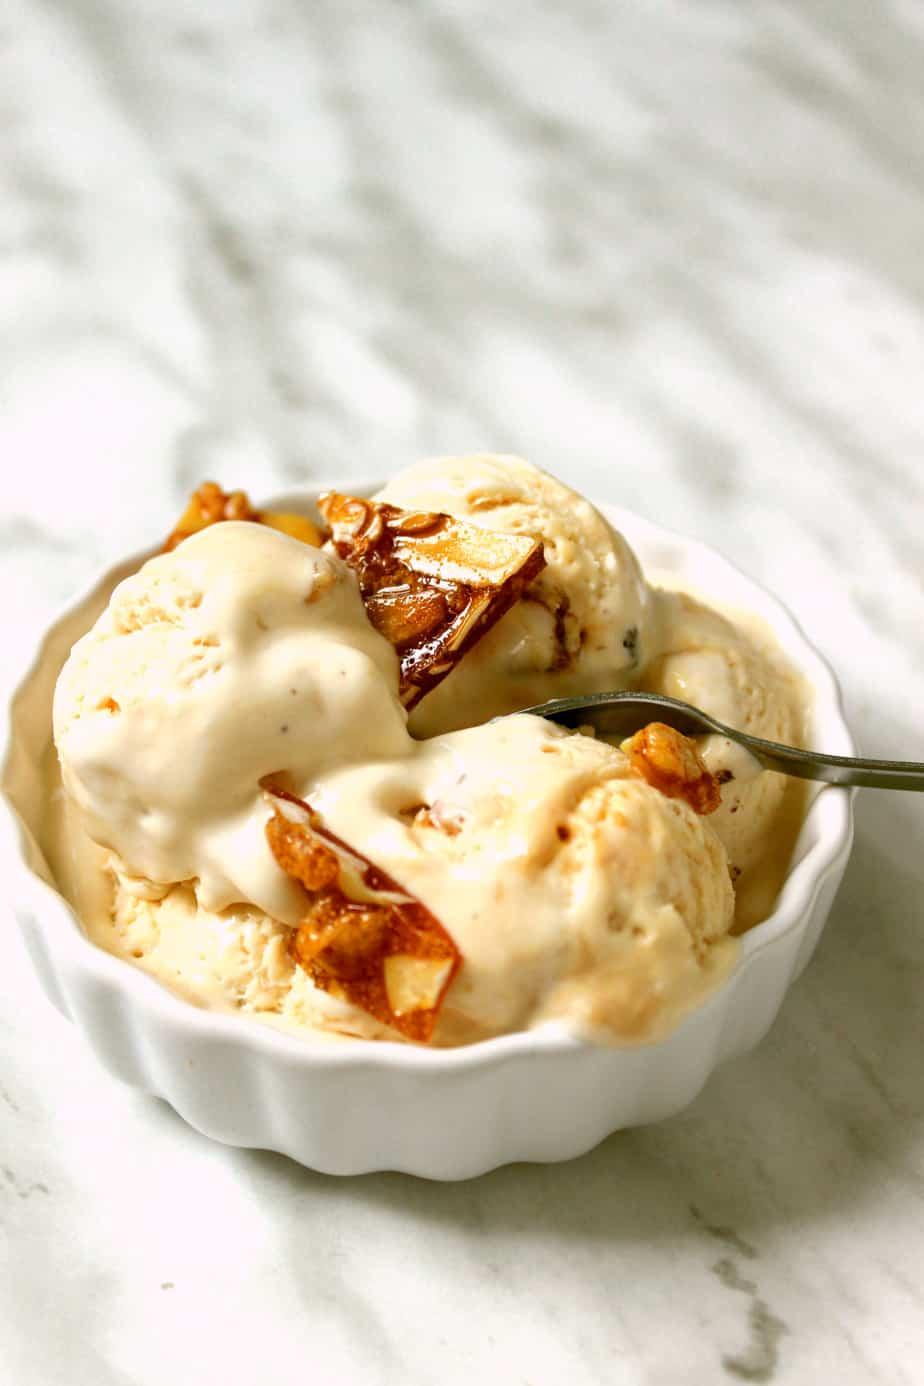 Caramel Crunch Ice Cream